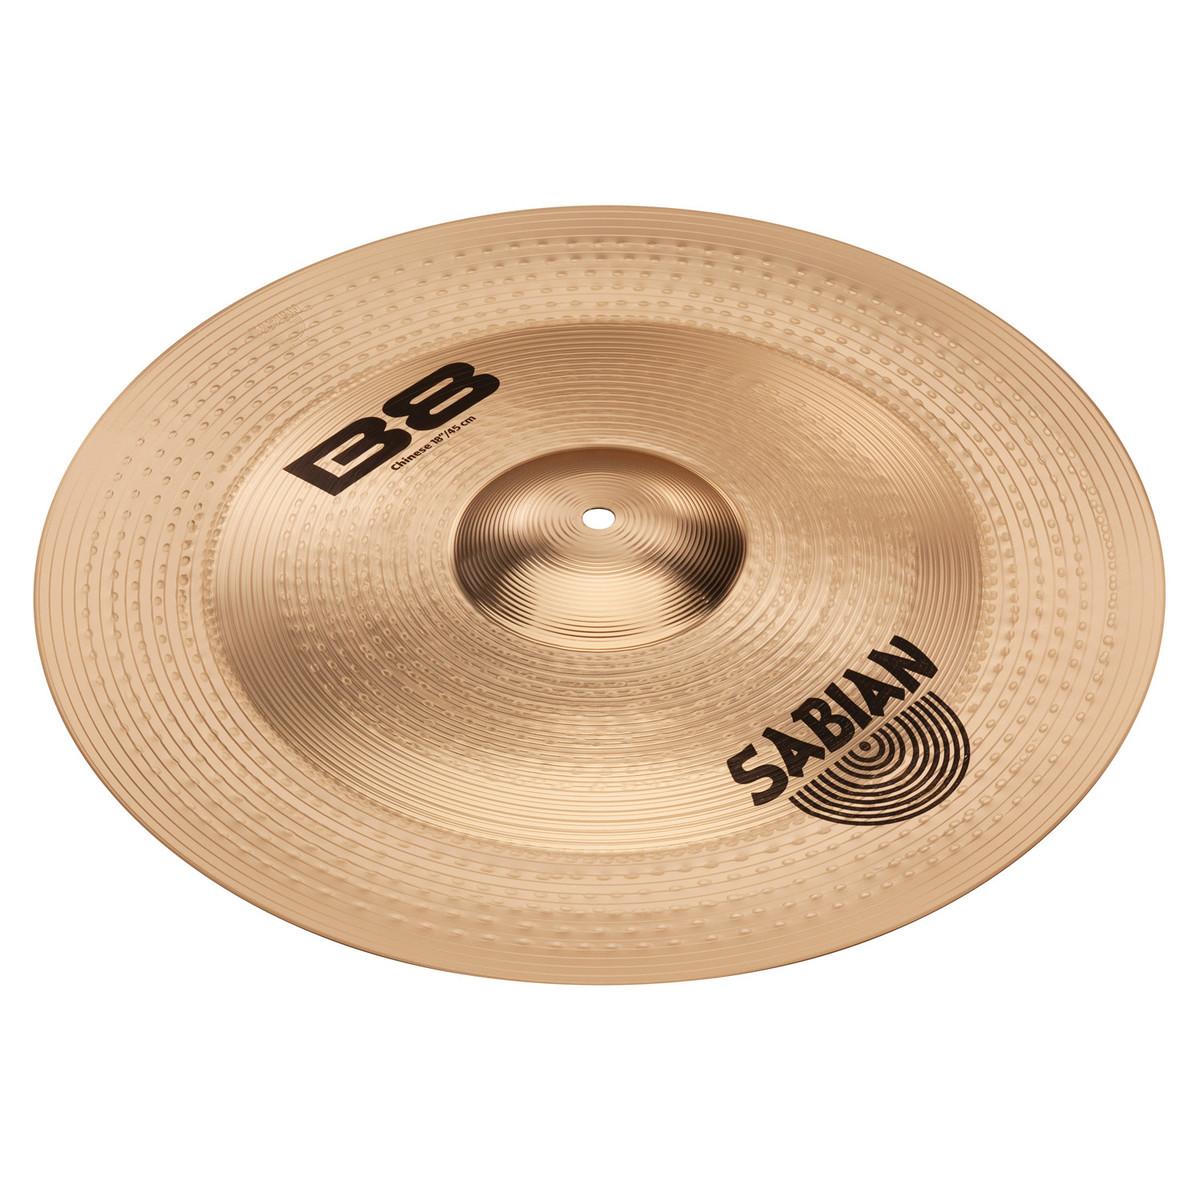 disc sabian b8 effects pack 10 39 39 splash 18 39 39 china cymbals at. Black Bedroom Furniture Sets. Home Design Ideas